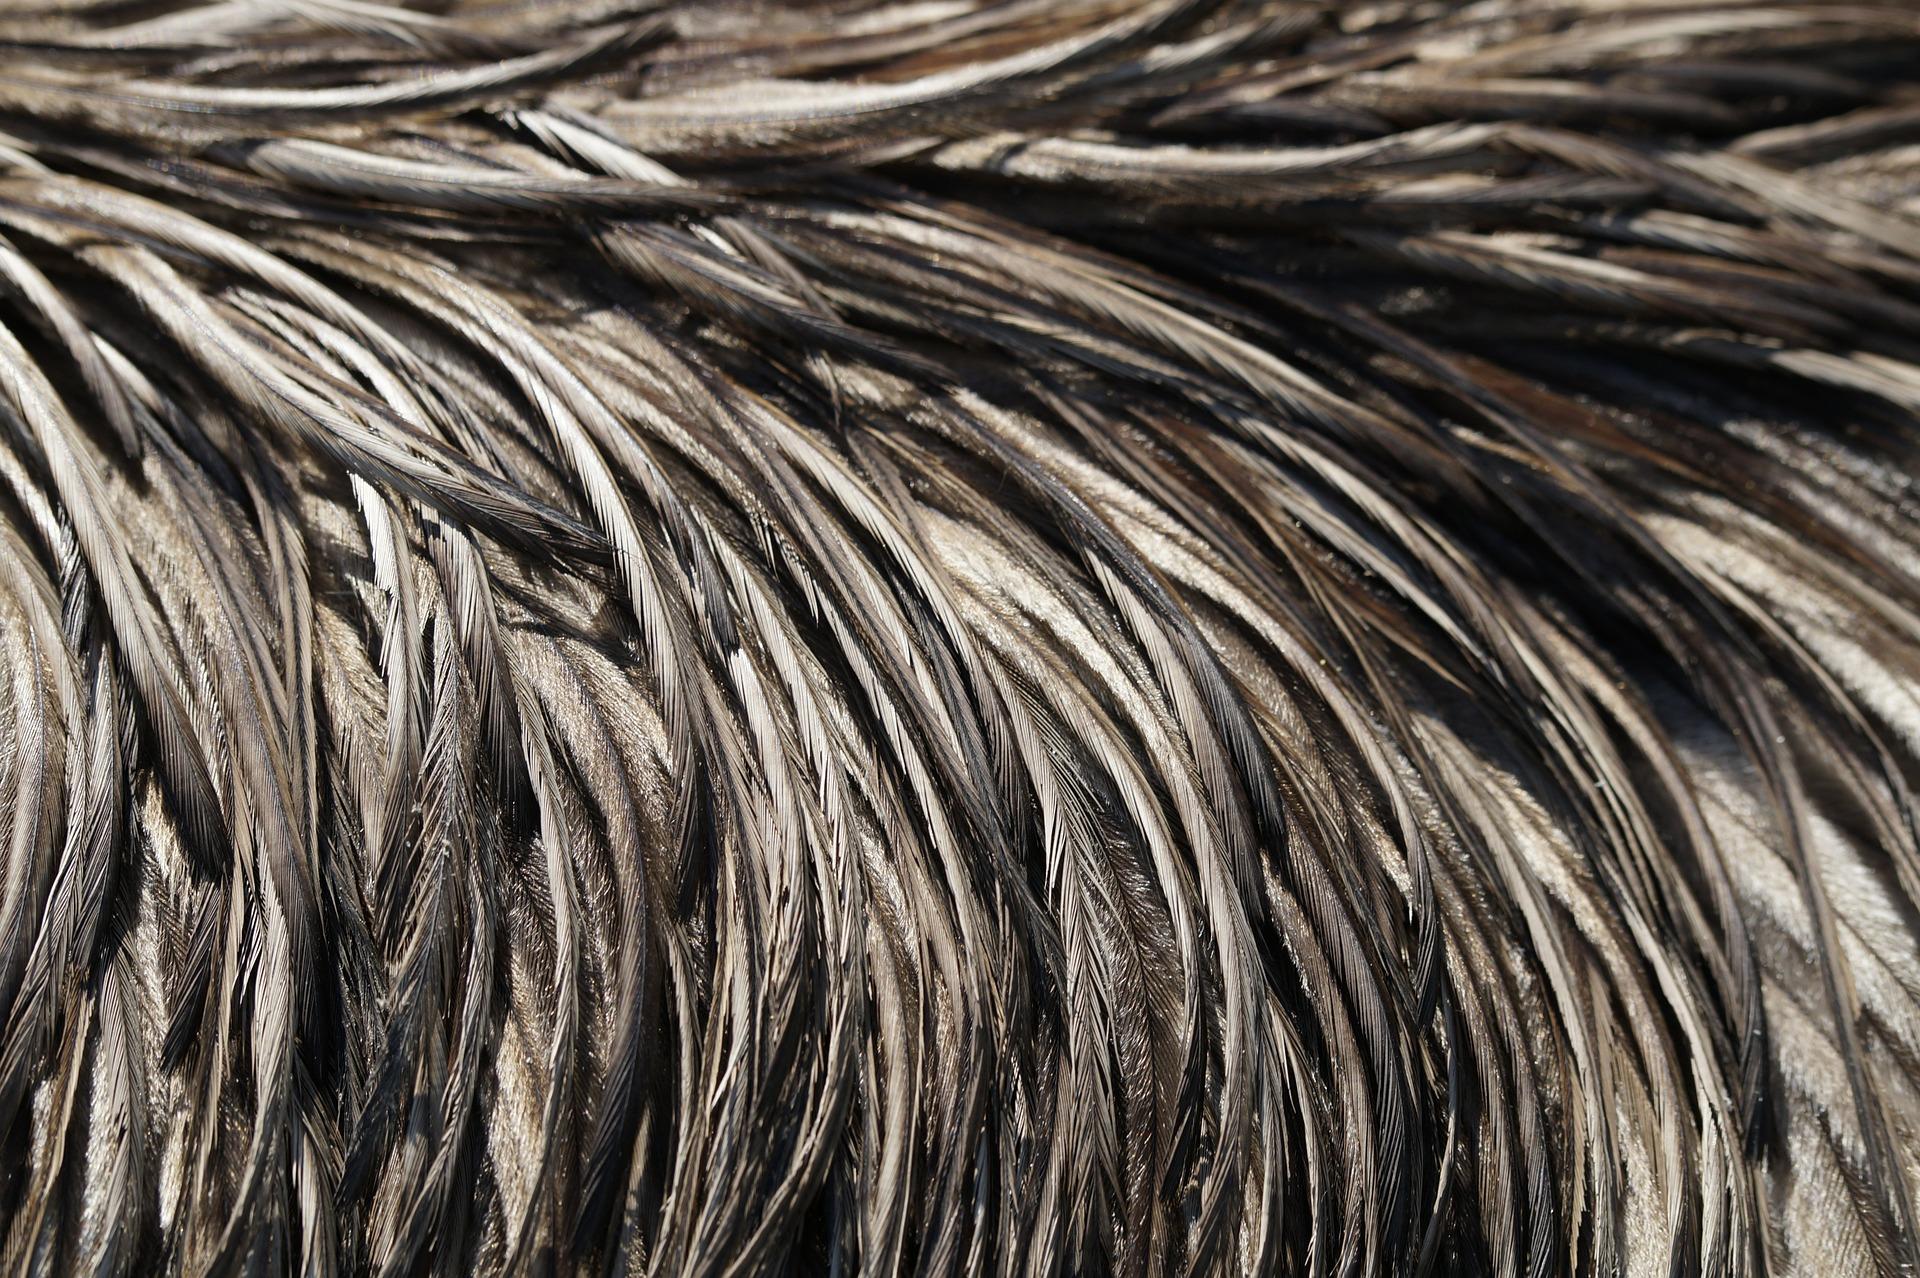 emu-feathers-332572_1920